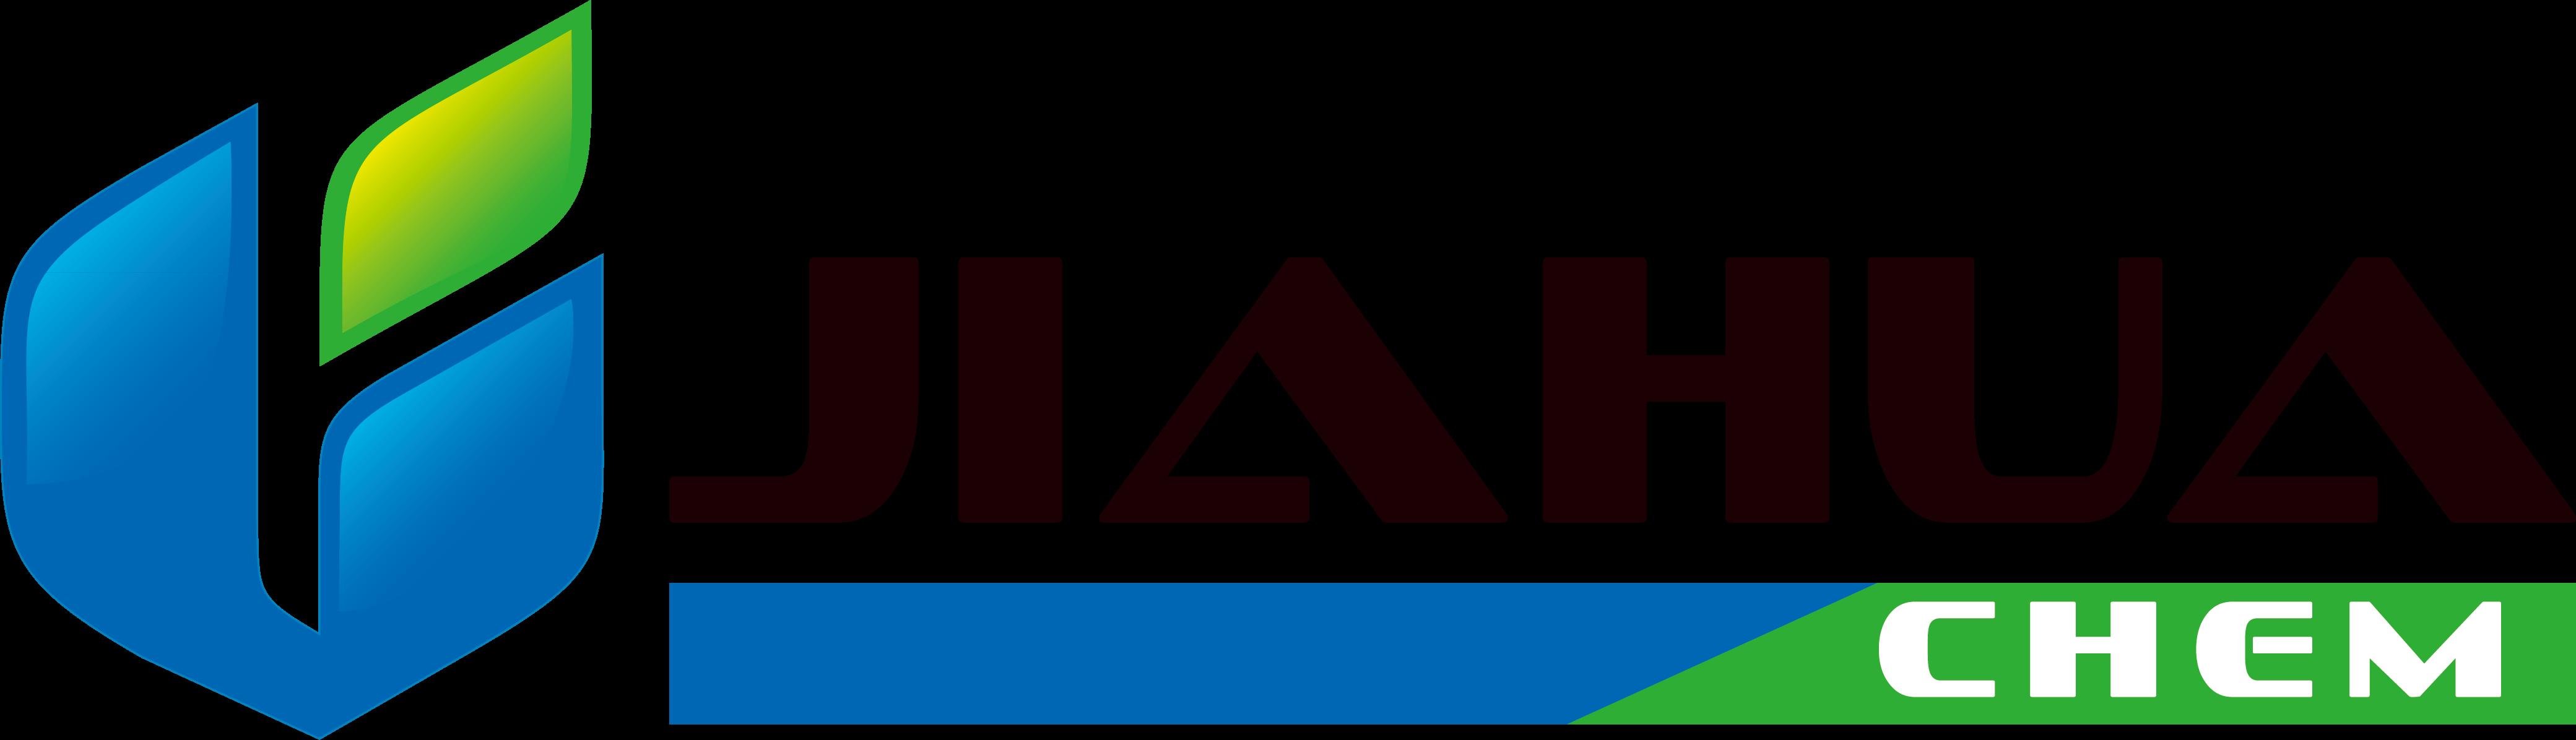 Jiahua Chemicals Inc